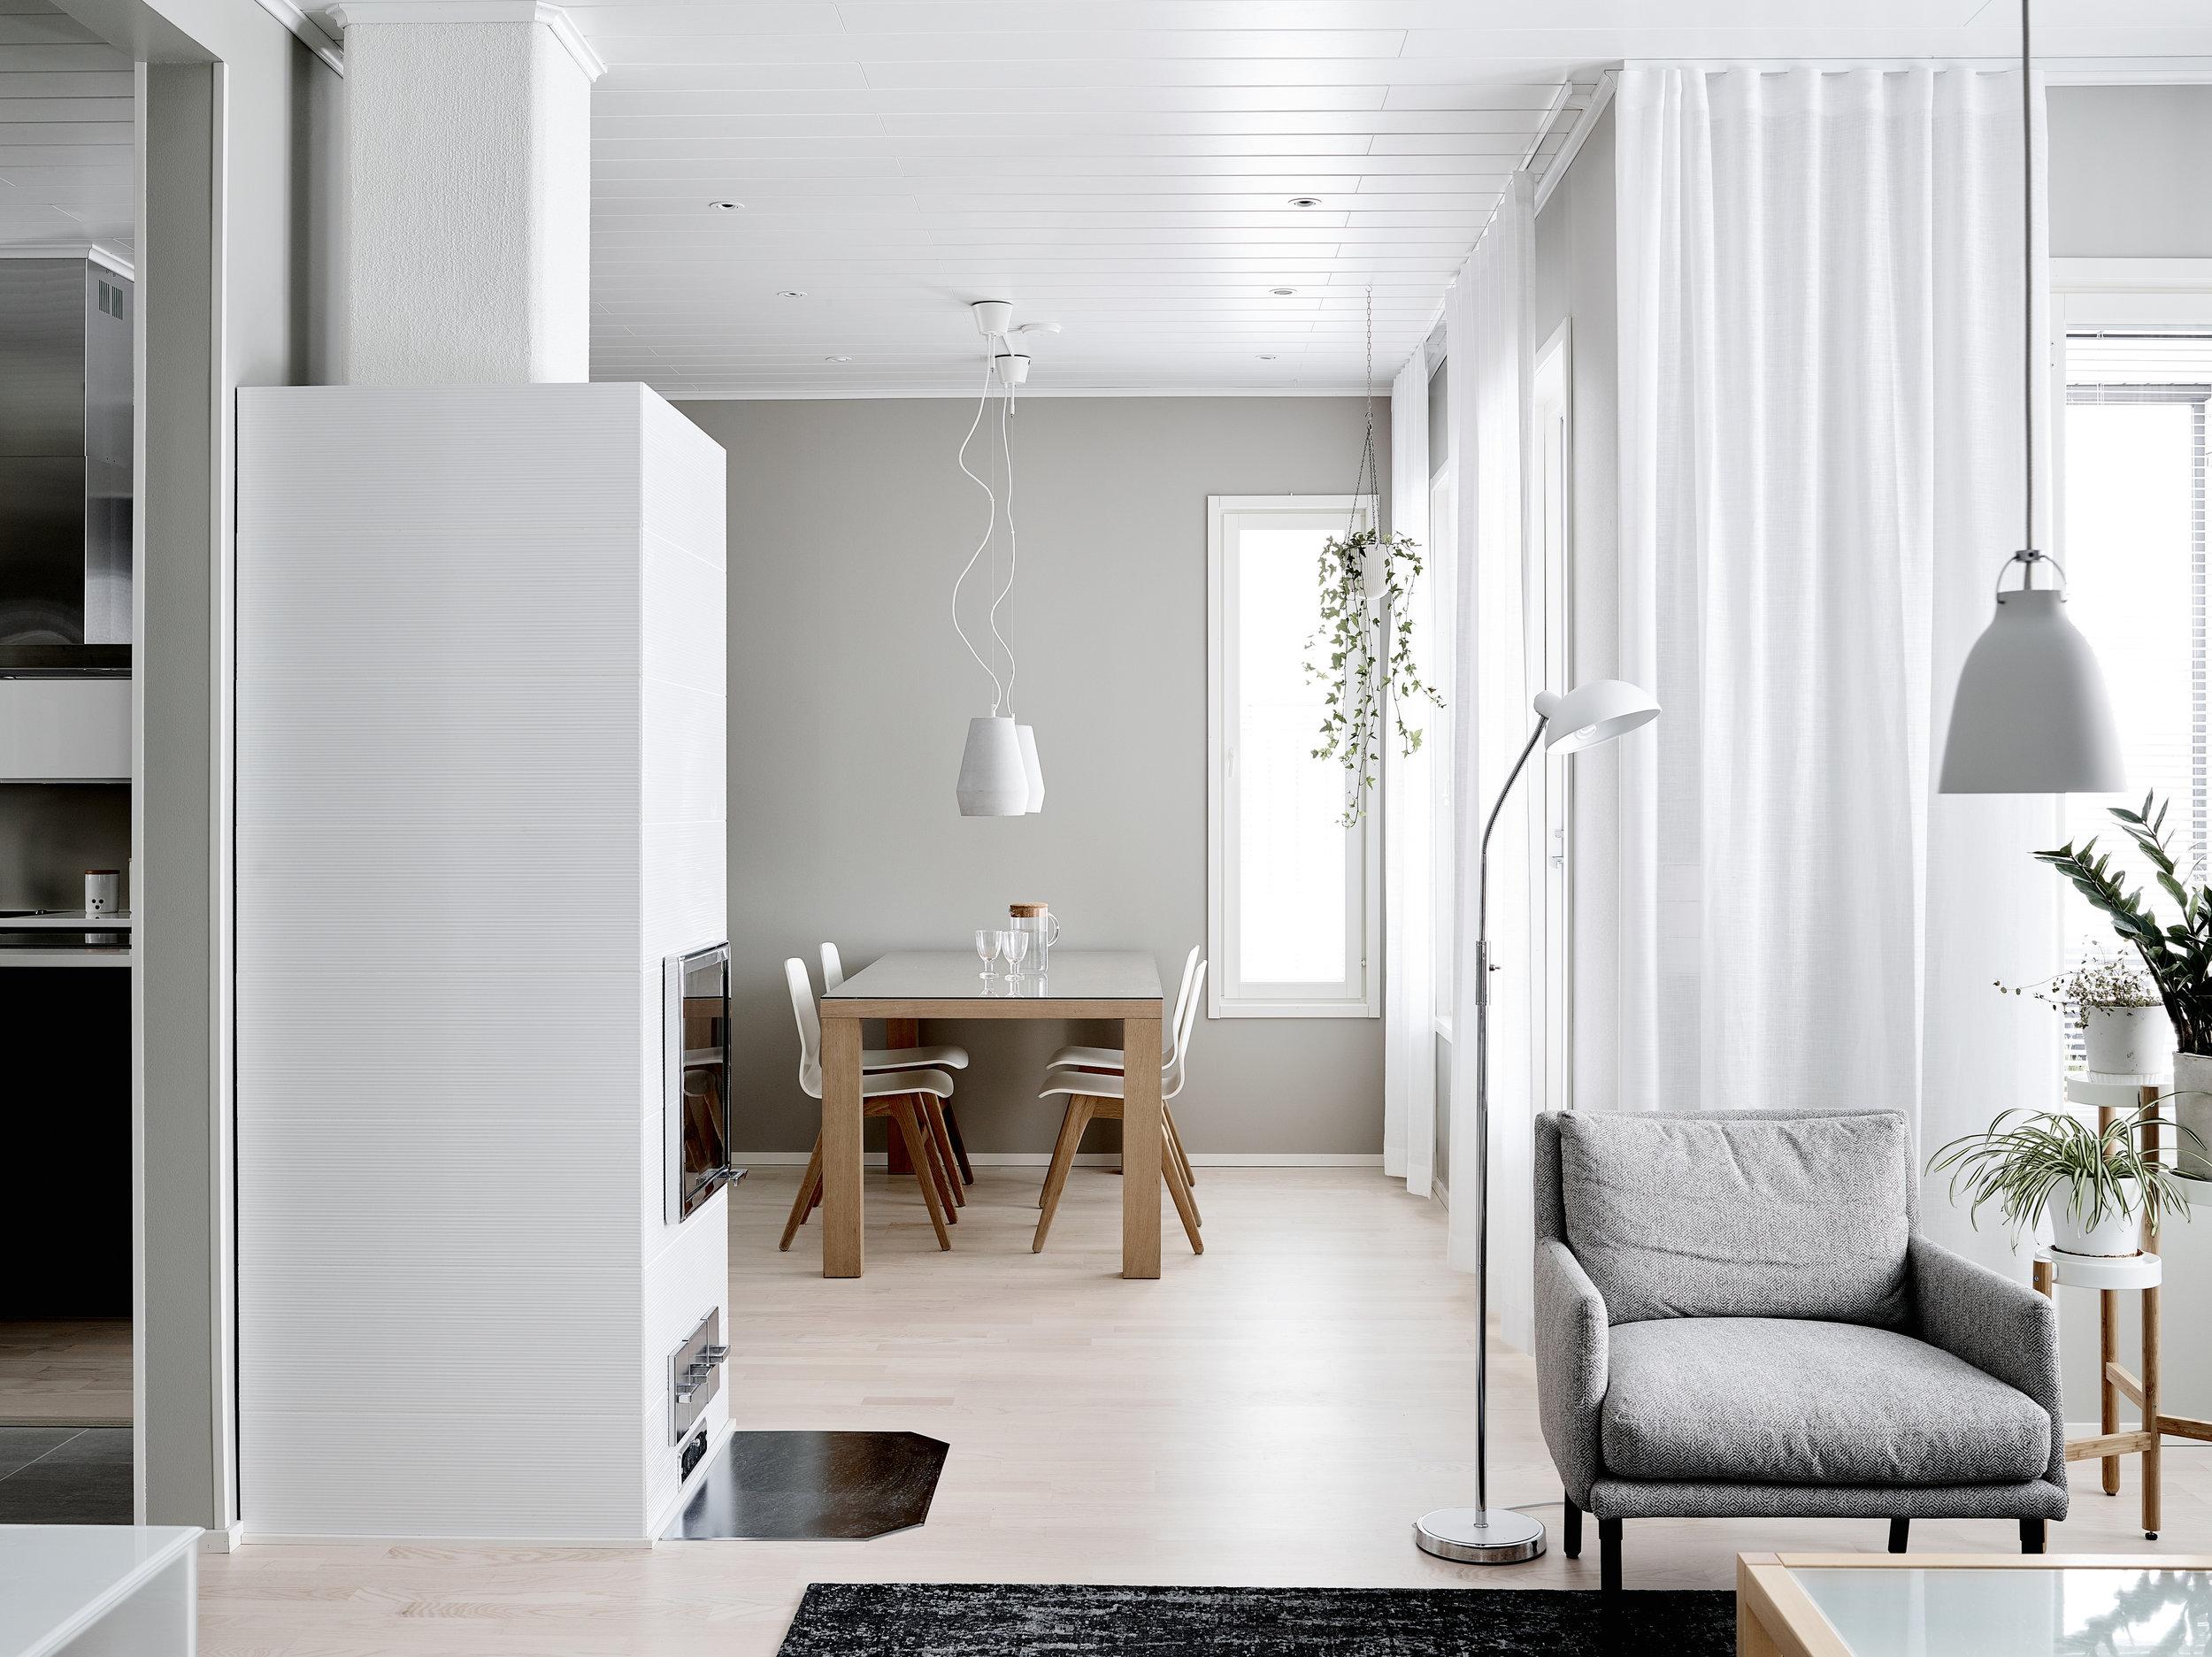 interior-anna-koponen-photo-krista-keltanen-05.jpg